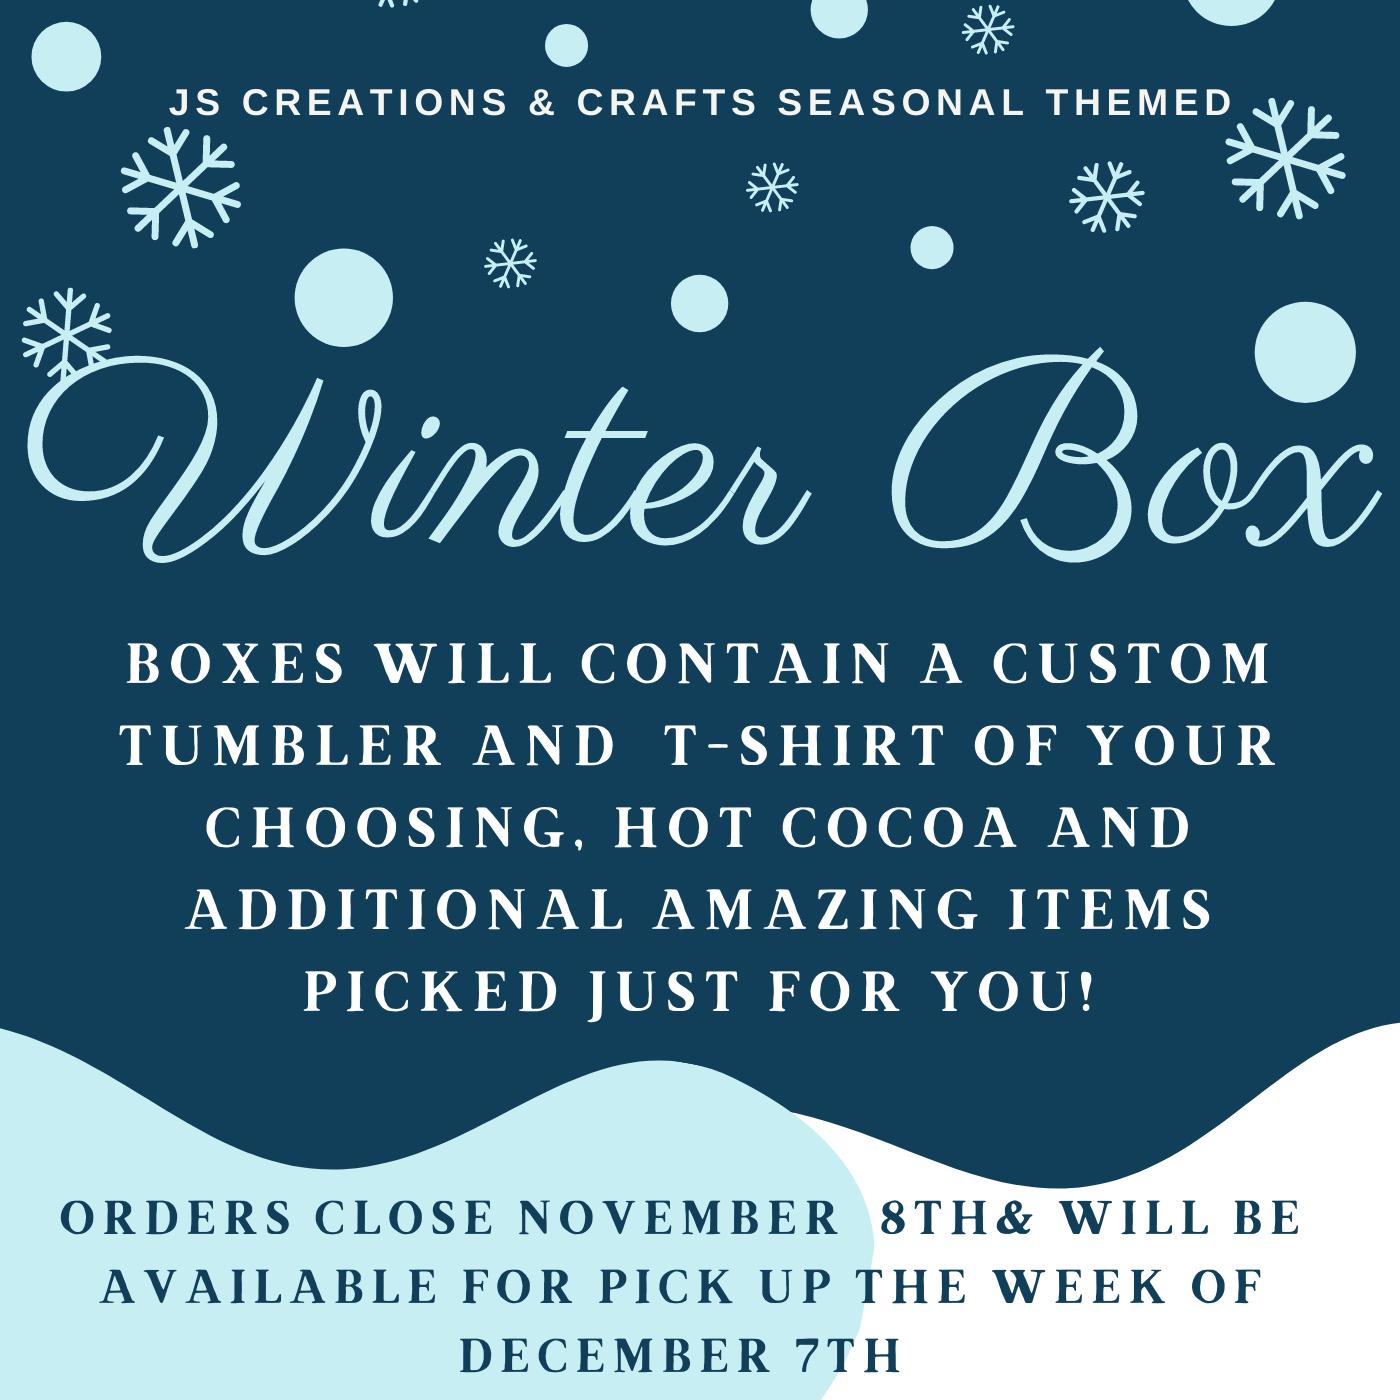 Winter Box (no shirt)